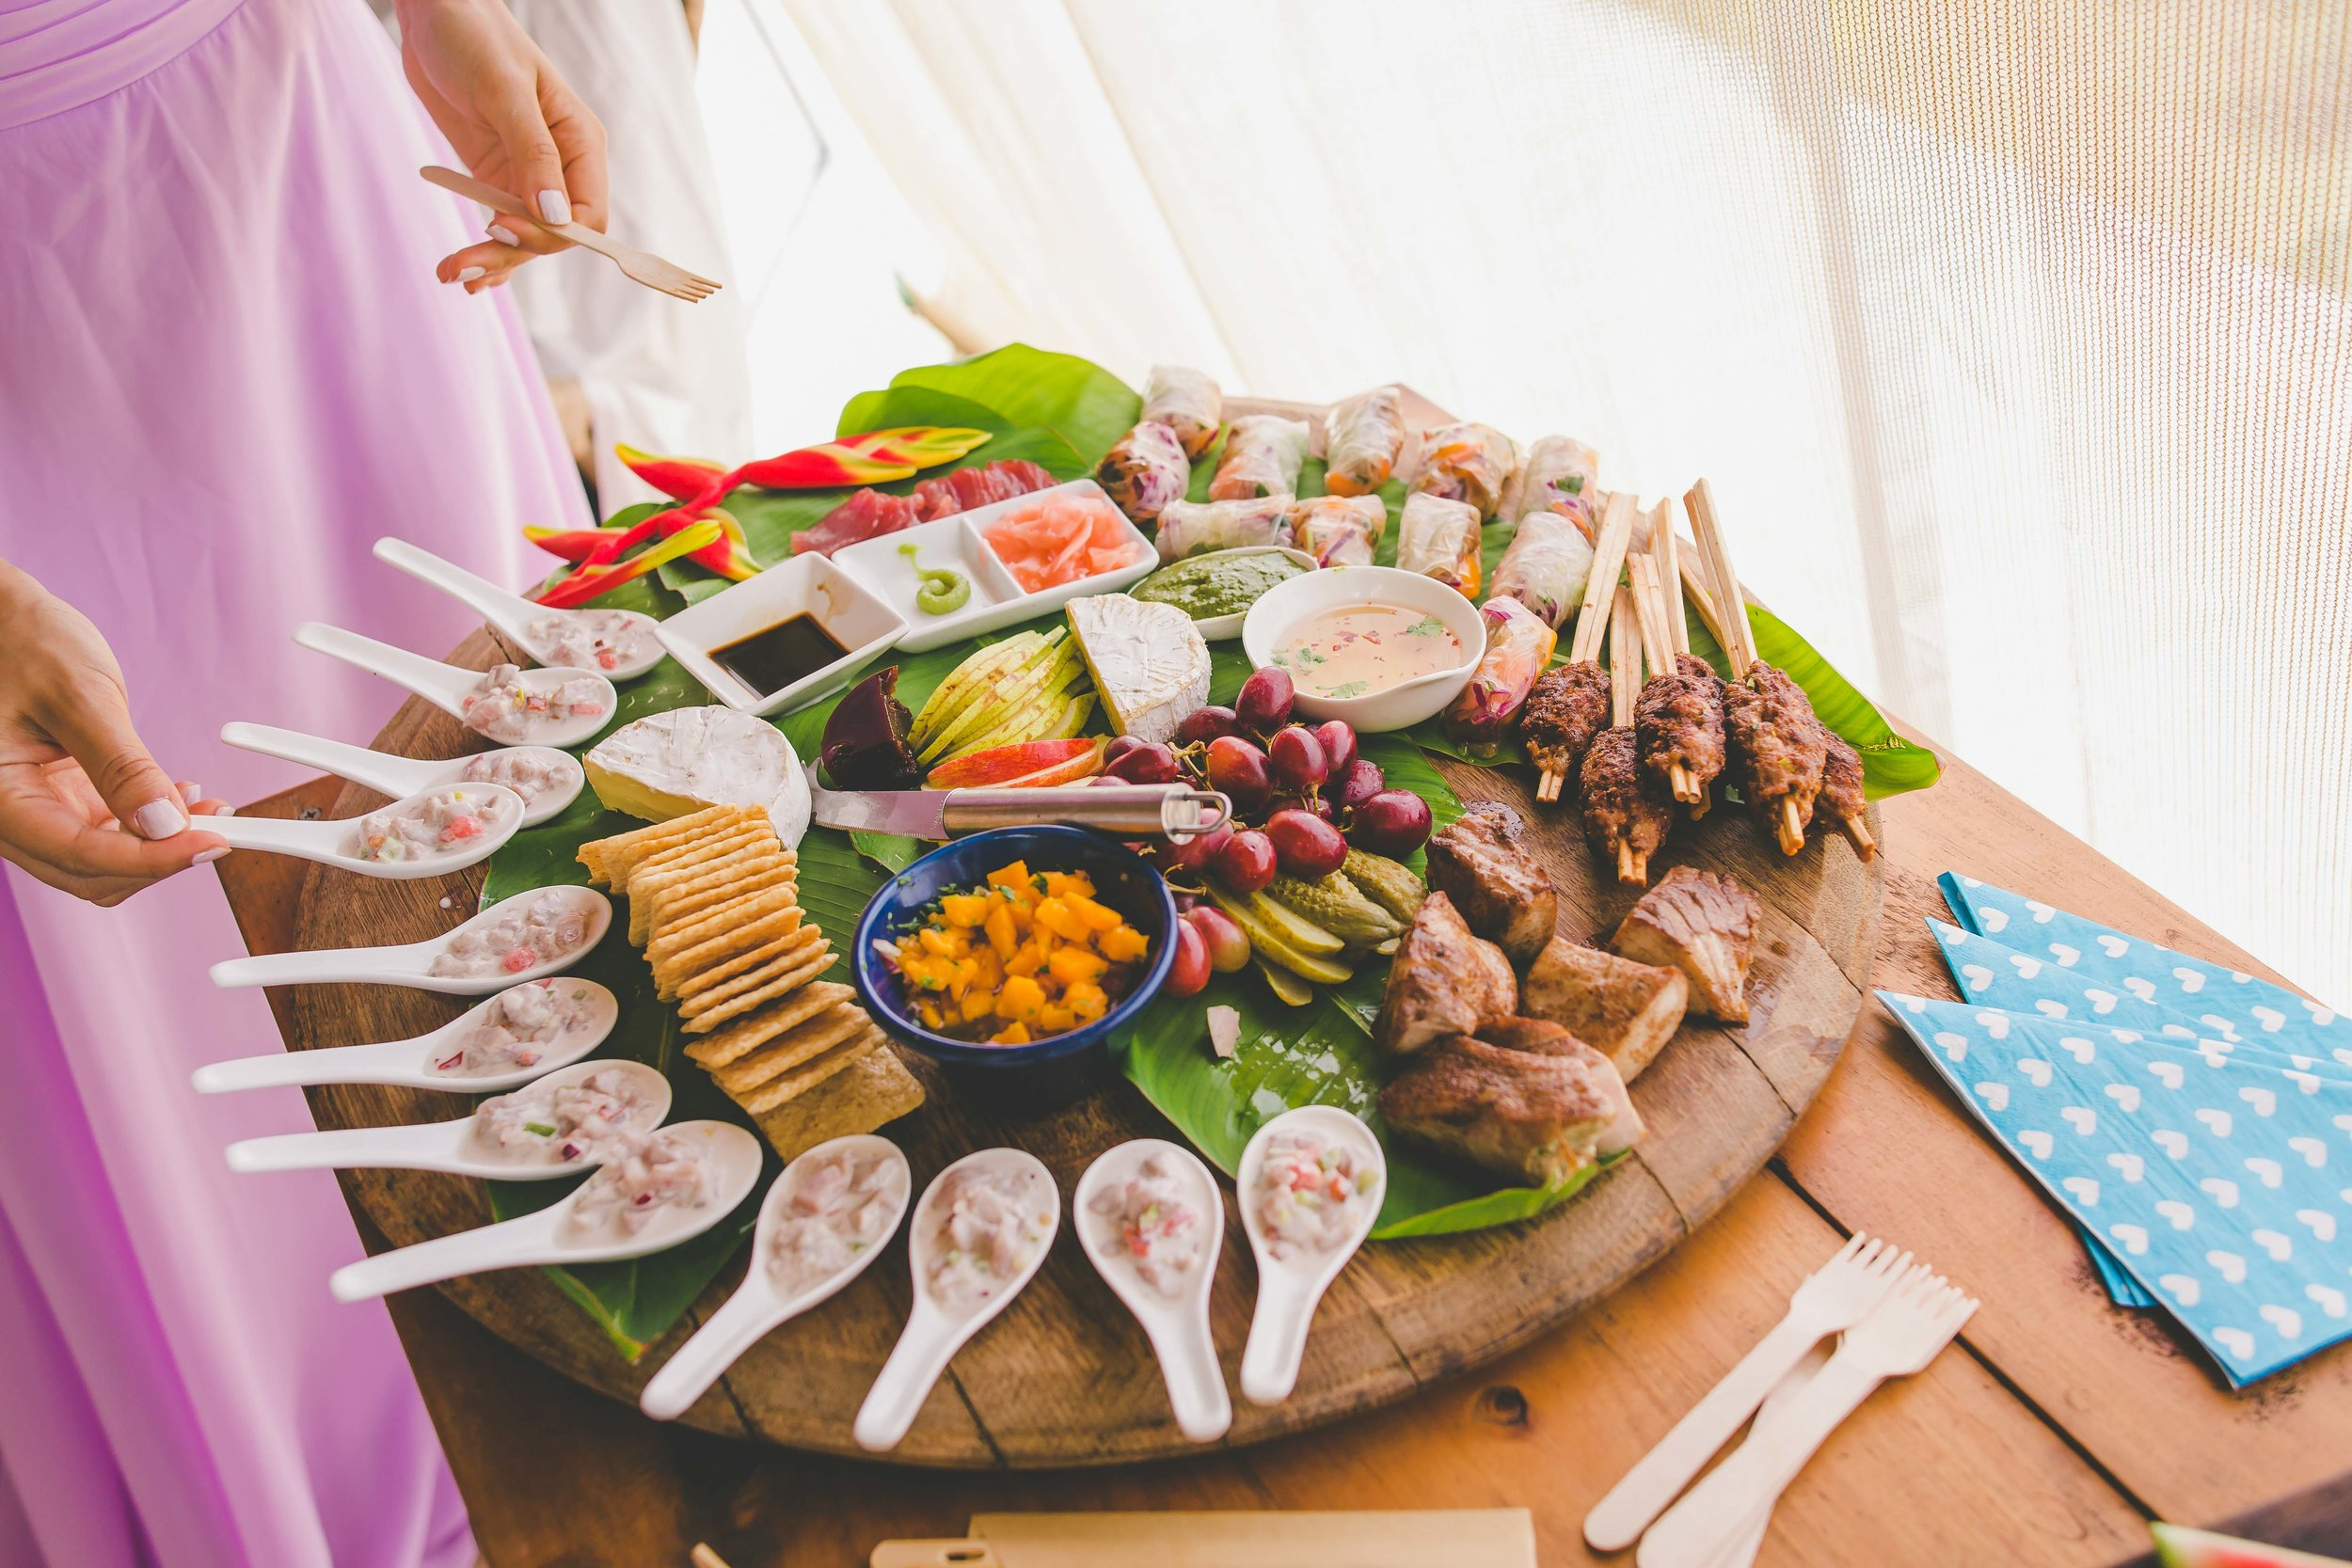 p.p1 {margin: 0.0px 0.0px 0.0px 0.0px; font: 12.0px Helvetica; color: #4a4f56; -webkit-text-stroke: #4a4f56; background-color: #f1f0f0} span.s1 {font-kerning: none}    Ikurangi Eco Retreat Rarotonga cuisine